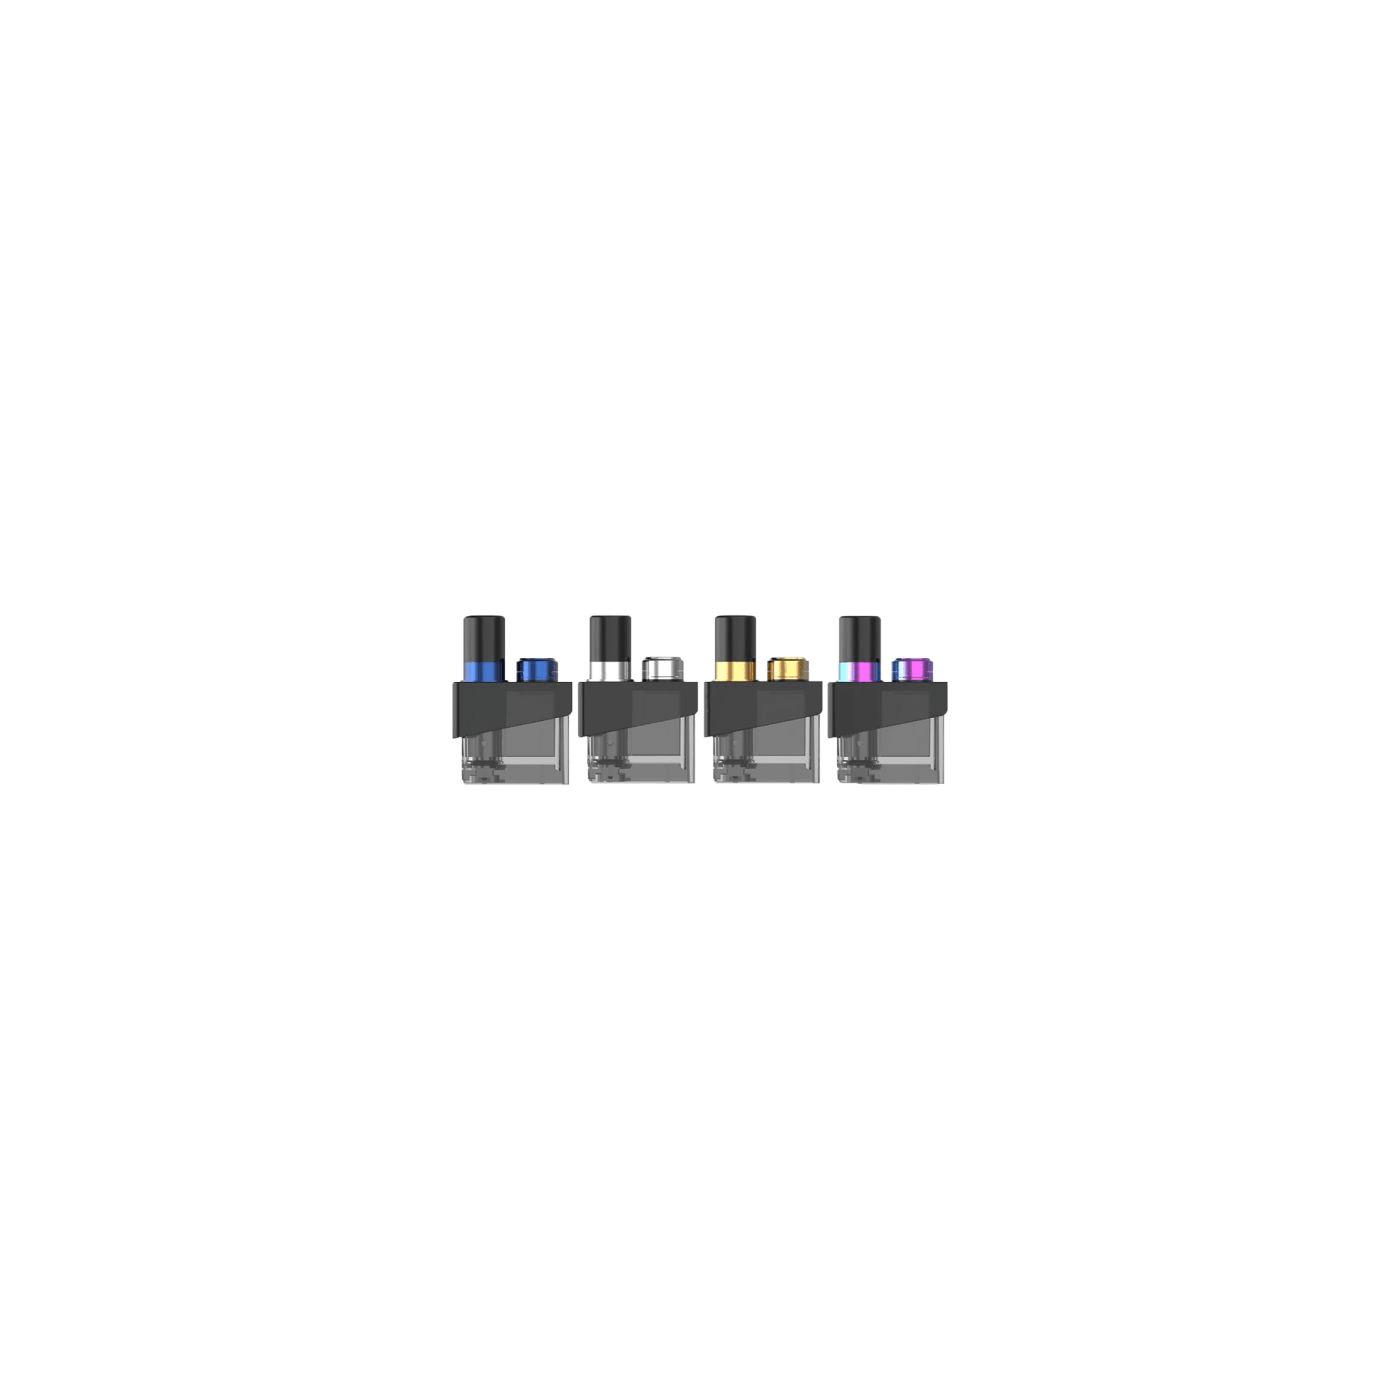 Smok Trinity Alpha Pod and Mesh 0.6 ohm/0.8 ohm Coils